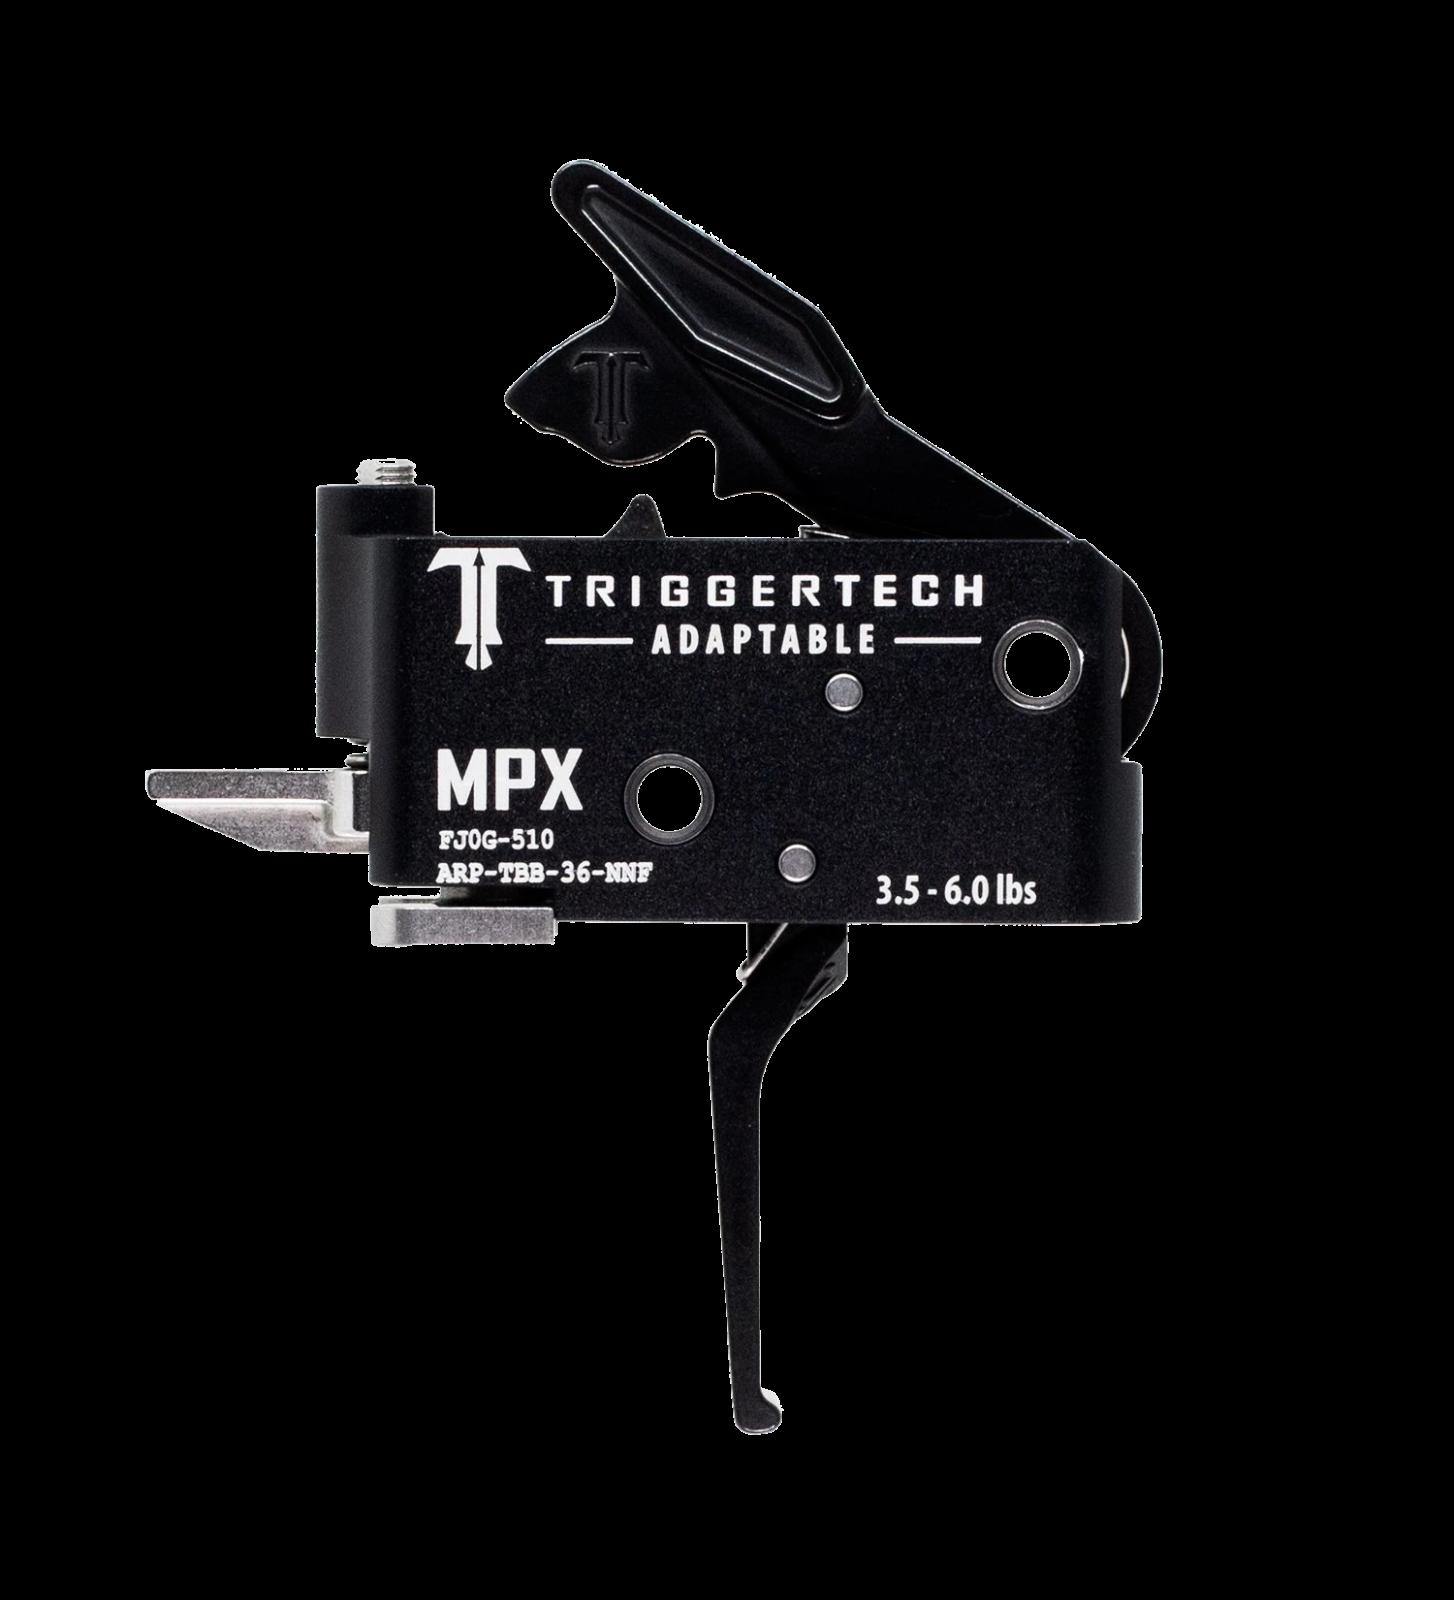 Spoušť TriggerTech SIG MPX Adaptable - rovná, černá